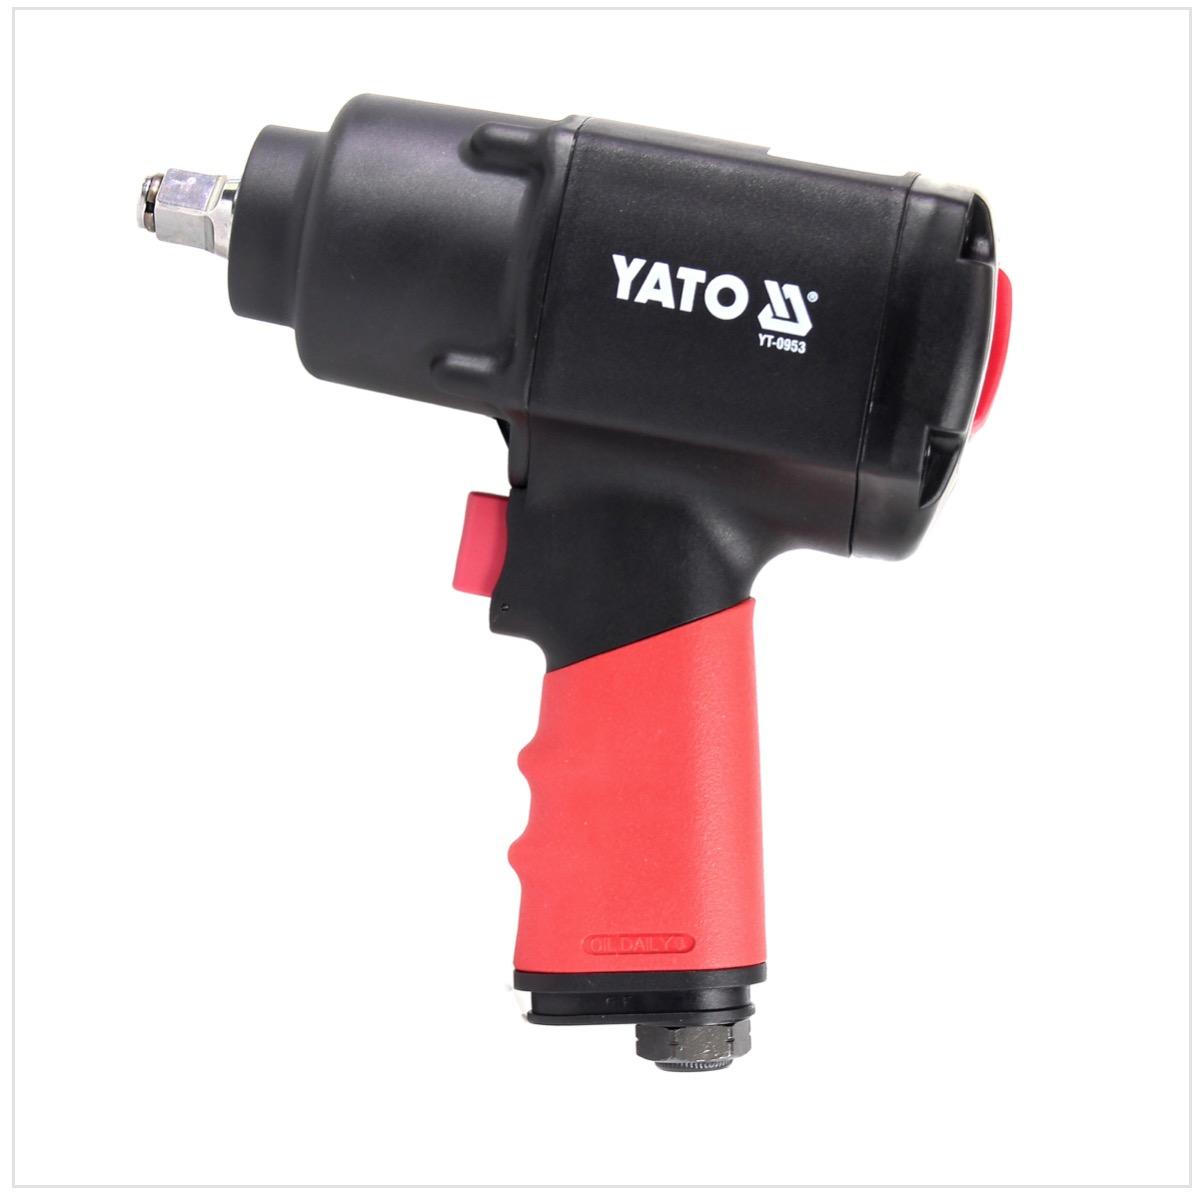 yato yt 0953 druckluft schlagschrauber 1356 nm 1 2. Black Bedroom Furniture Sets. Home Design Ideas